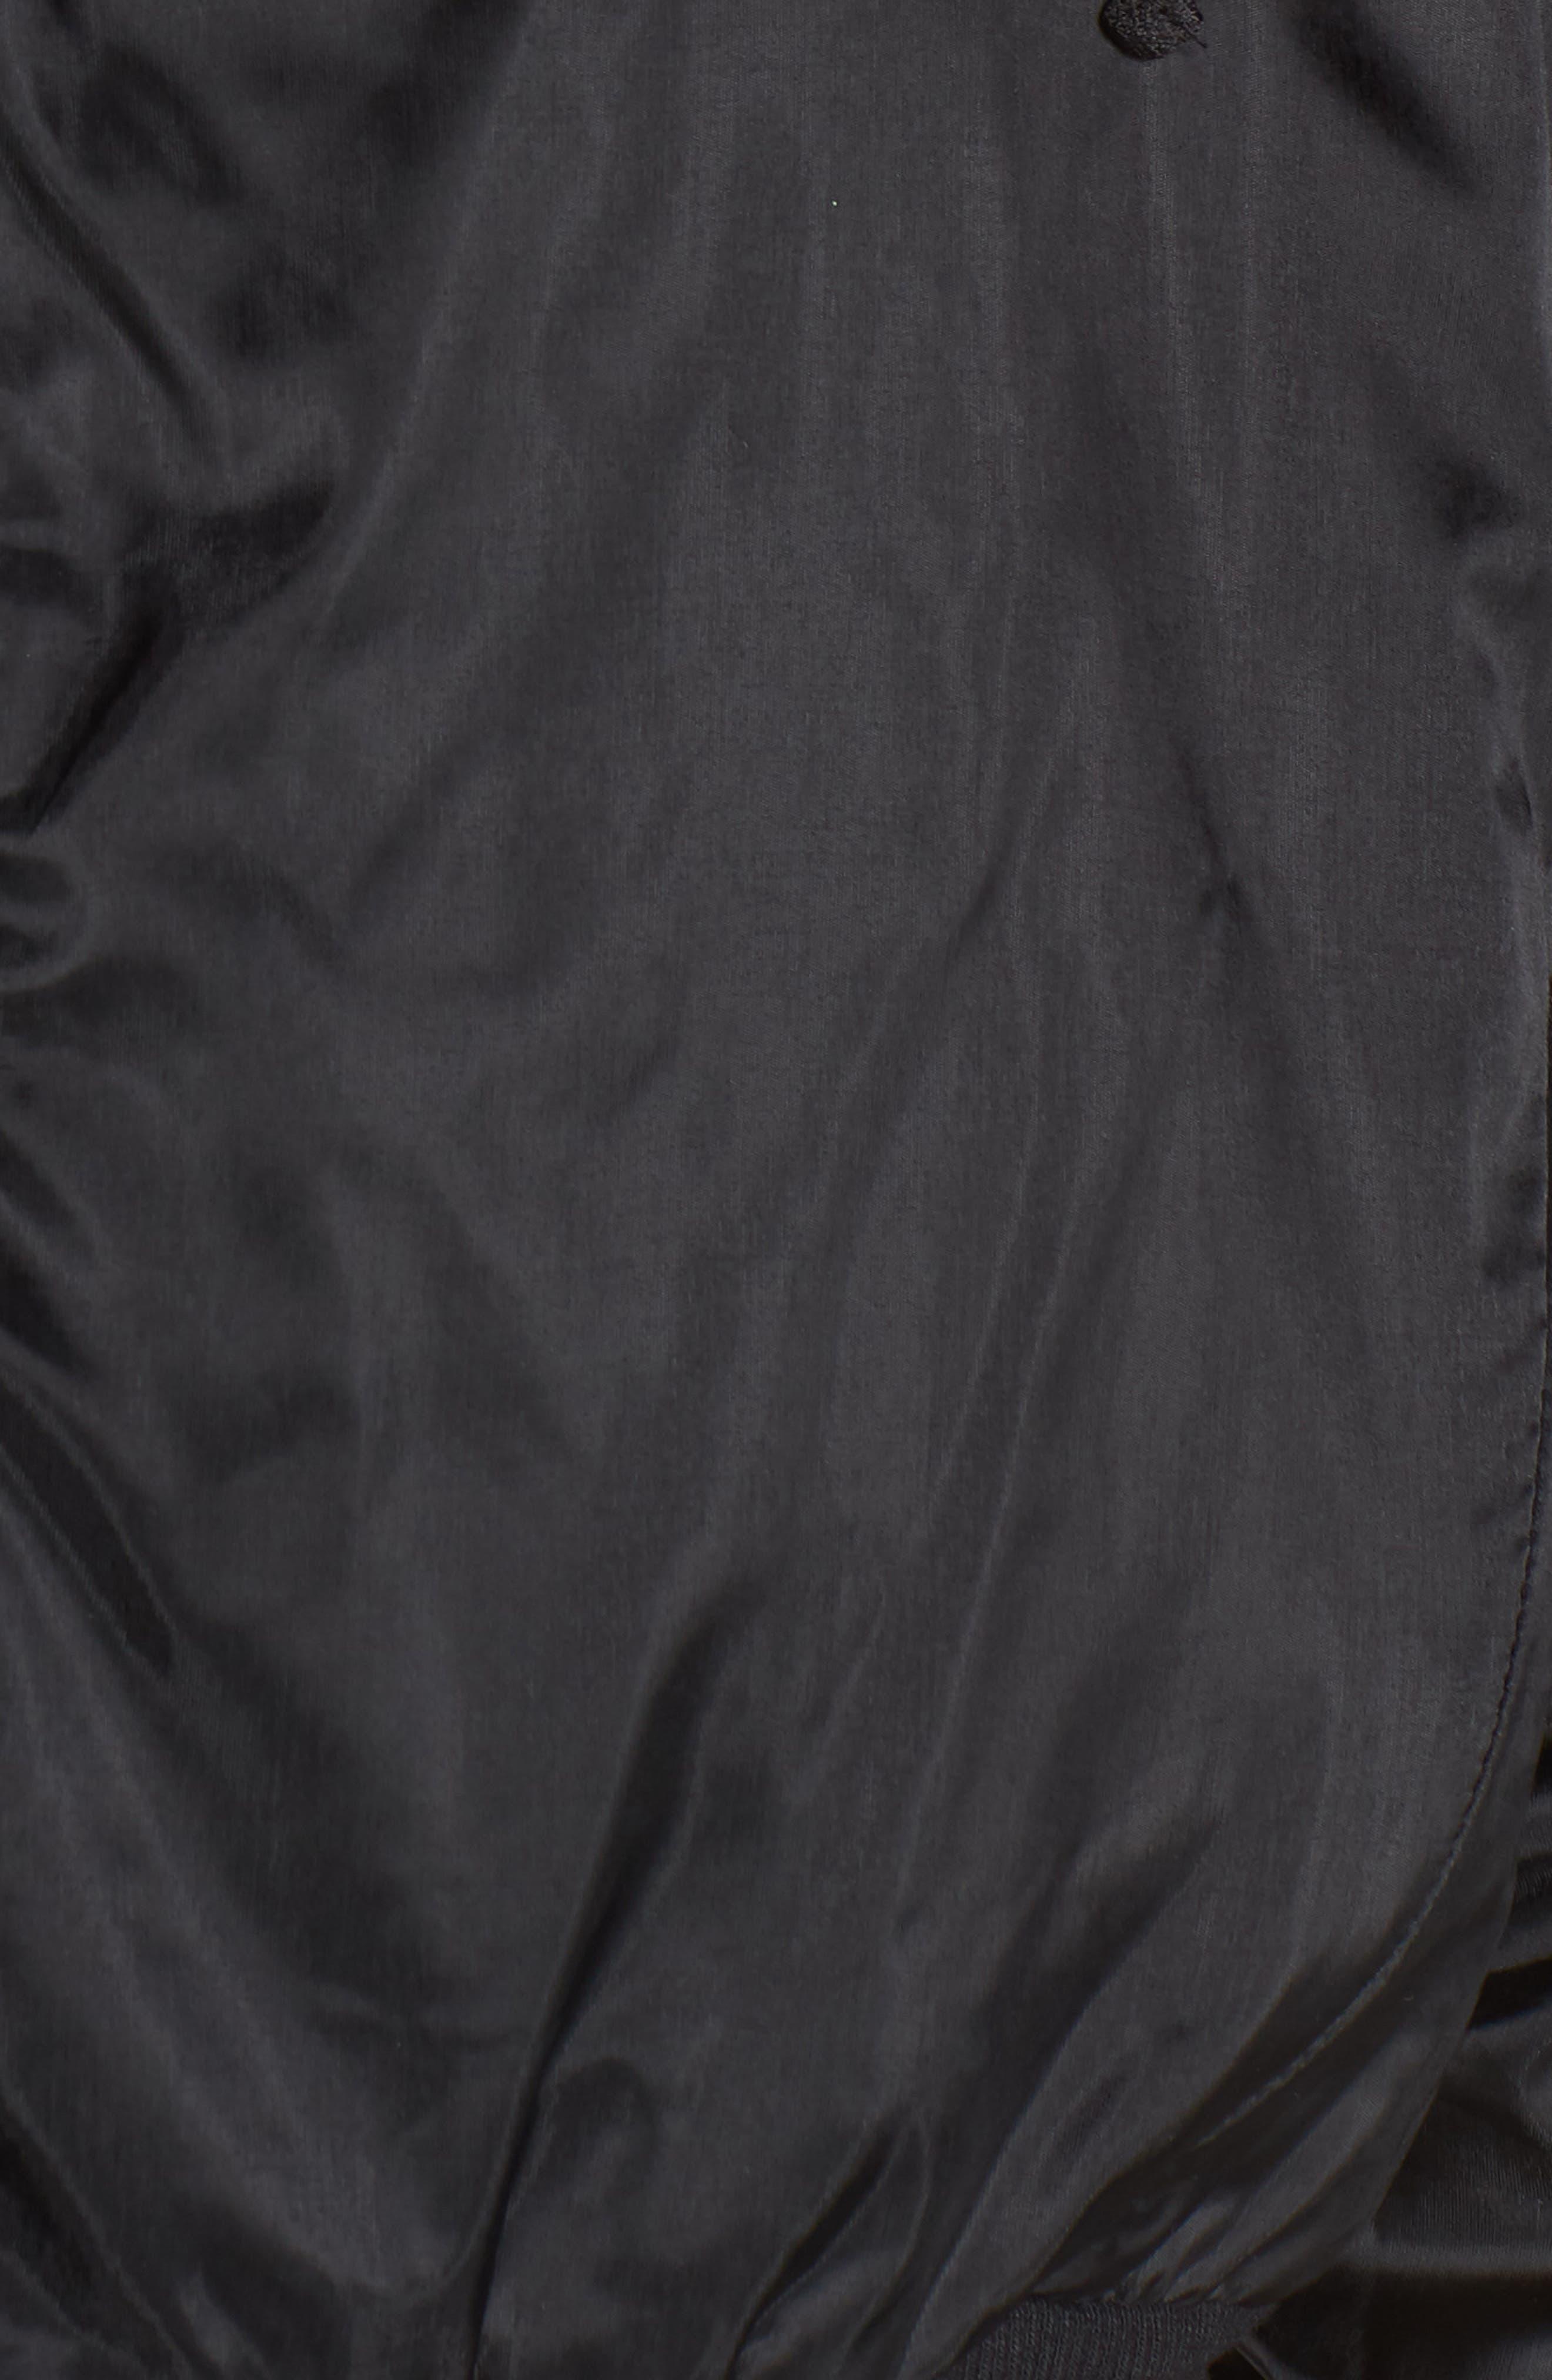 Aqua Jacket,                             Alternate thumbnail 7, color,                             BLACK